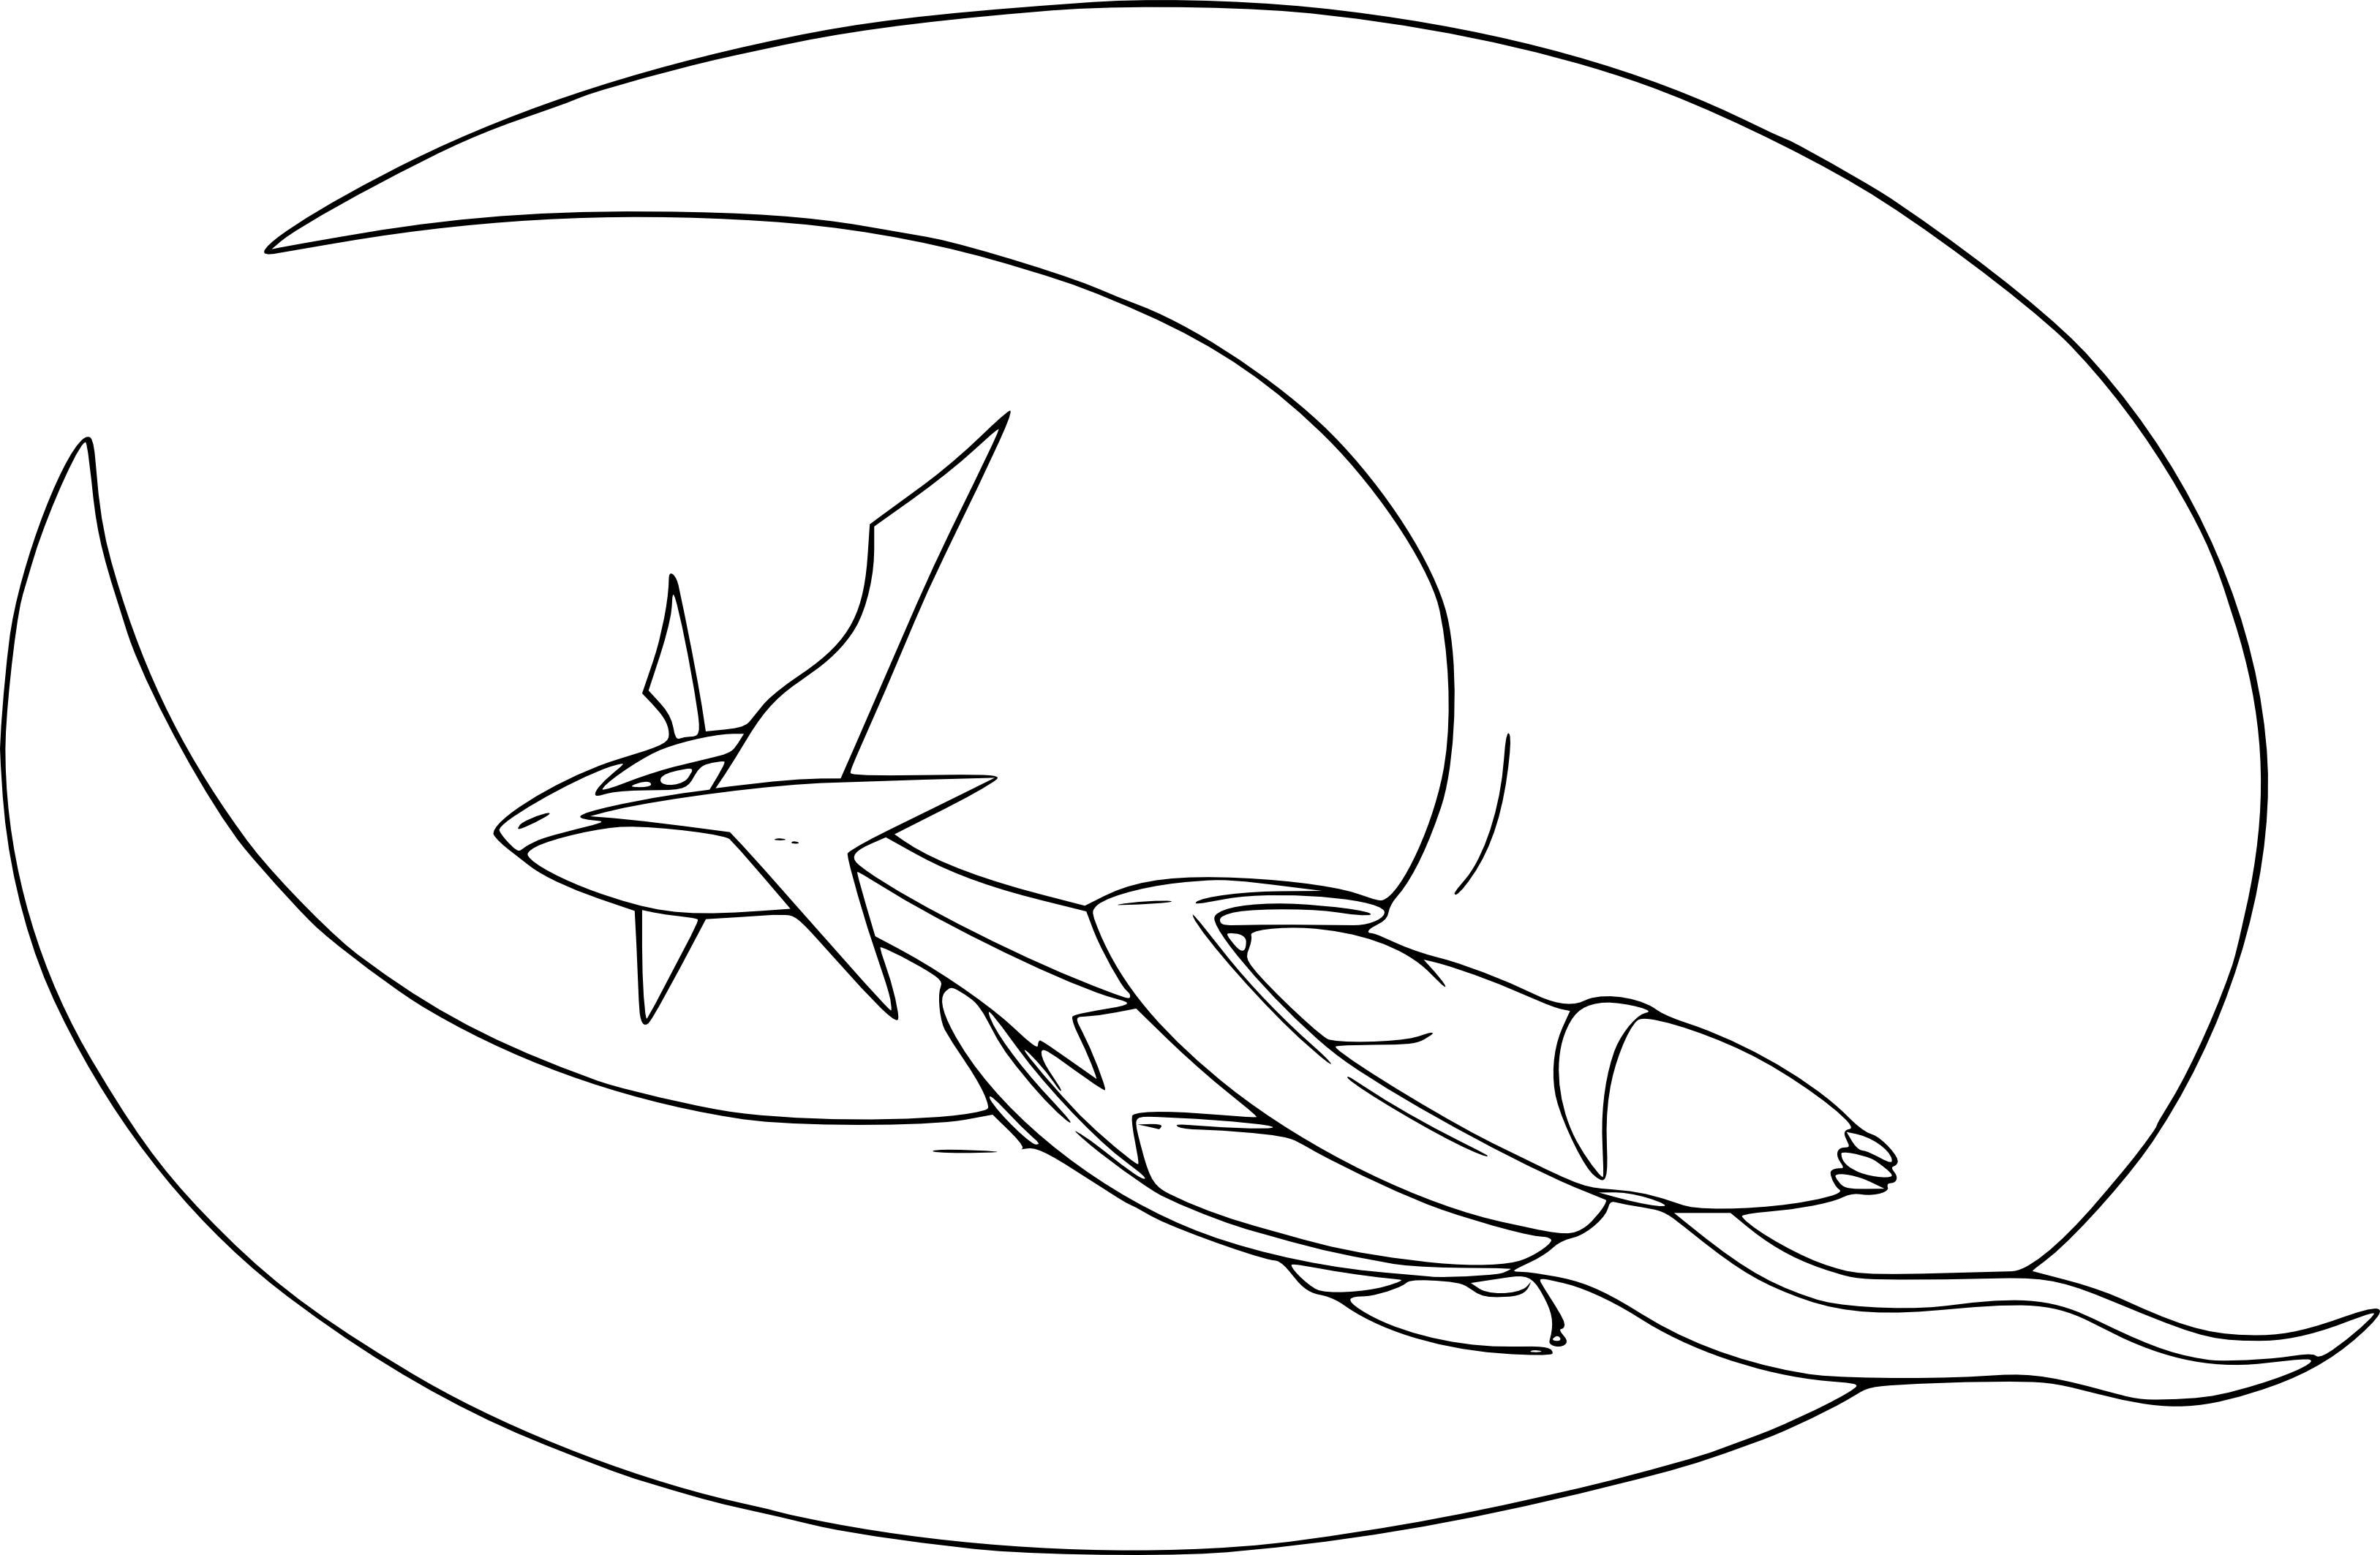 Coloriage m ga drattak pokemon imprimer - Des dessin a imprimer gratuit ...